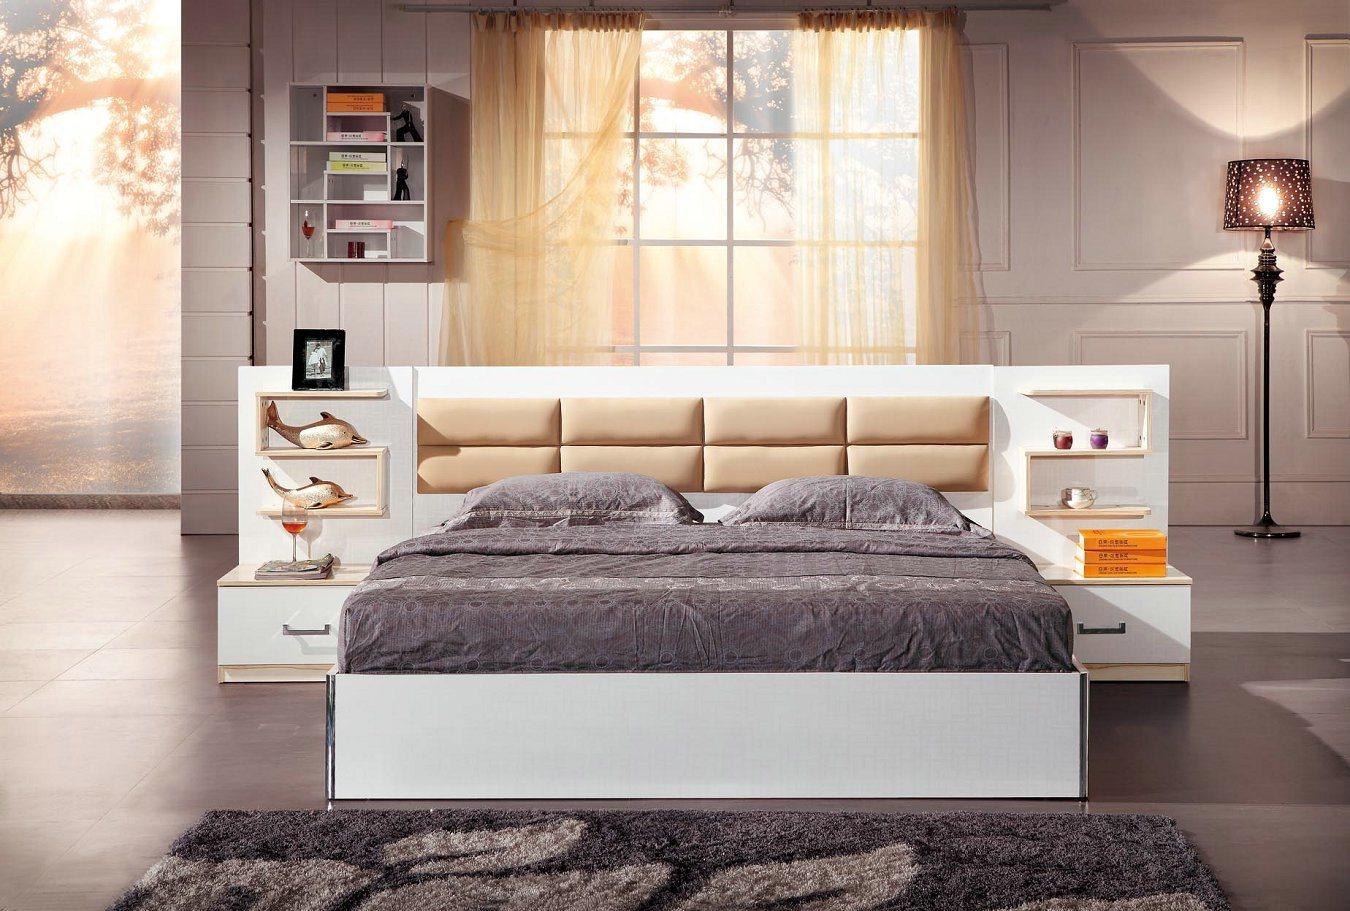 china bedroom furniture home furniture livingroom furniture supplier zhonghai fengqing furniture co ltd bedroom furniture china